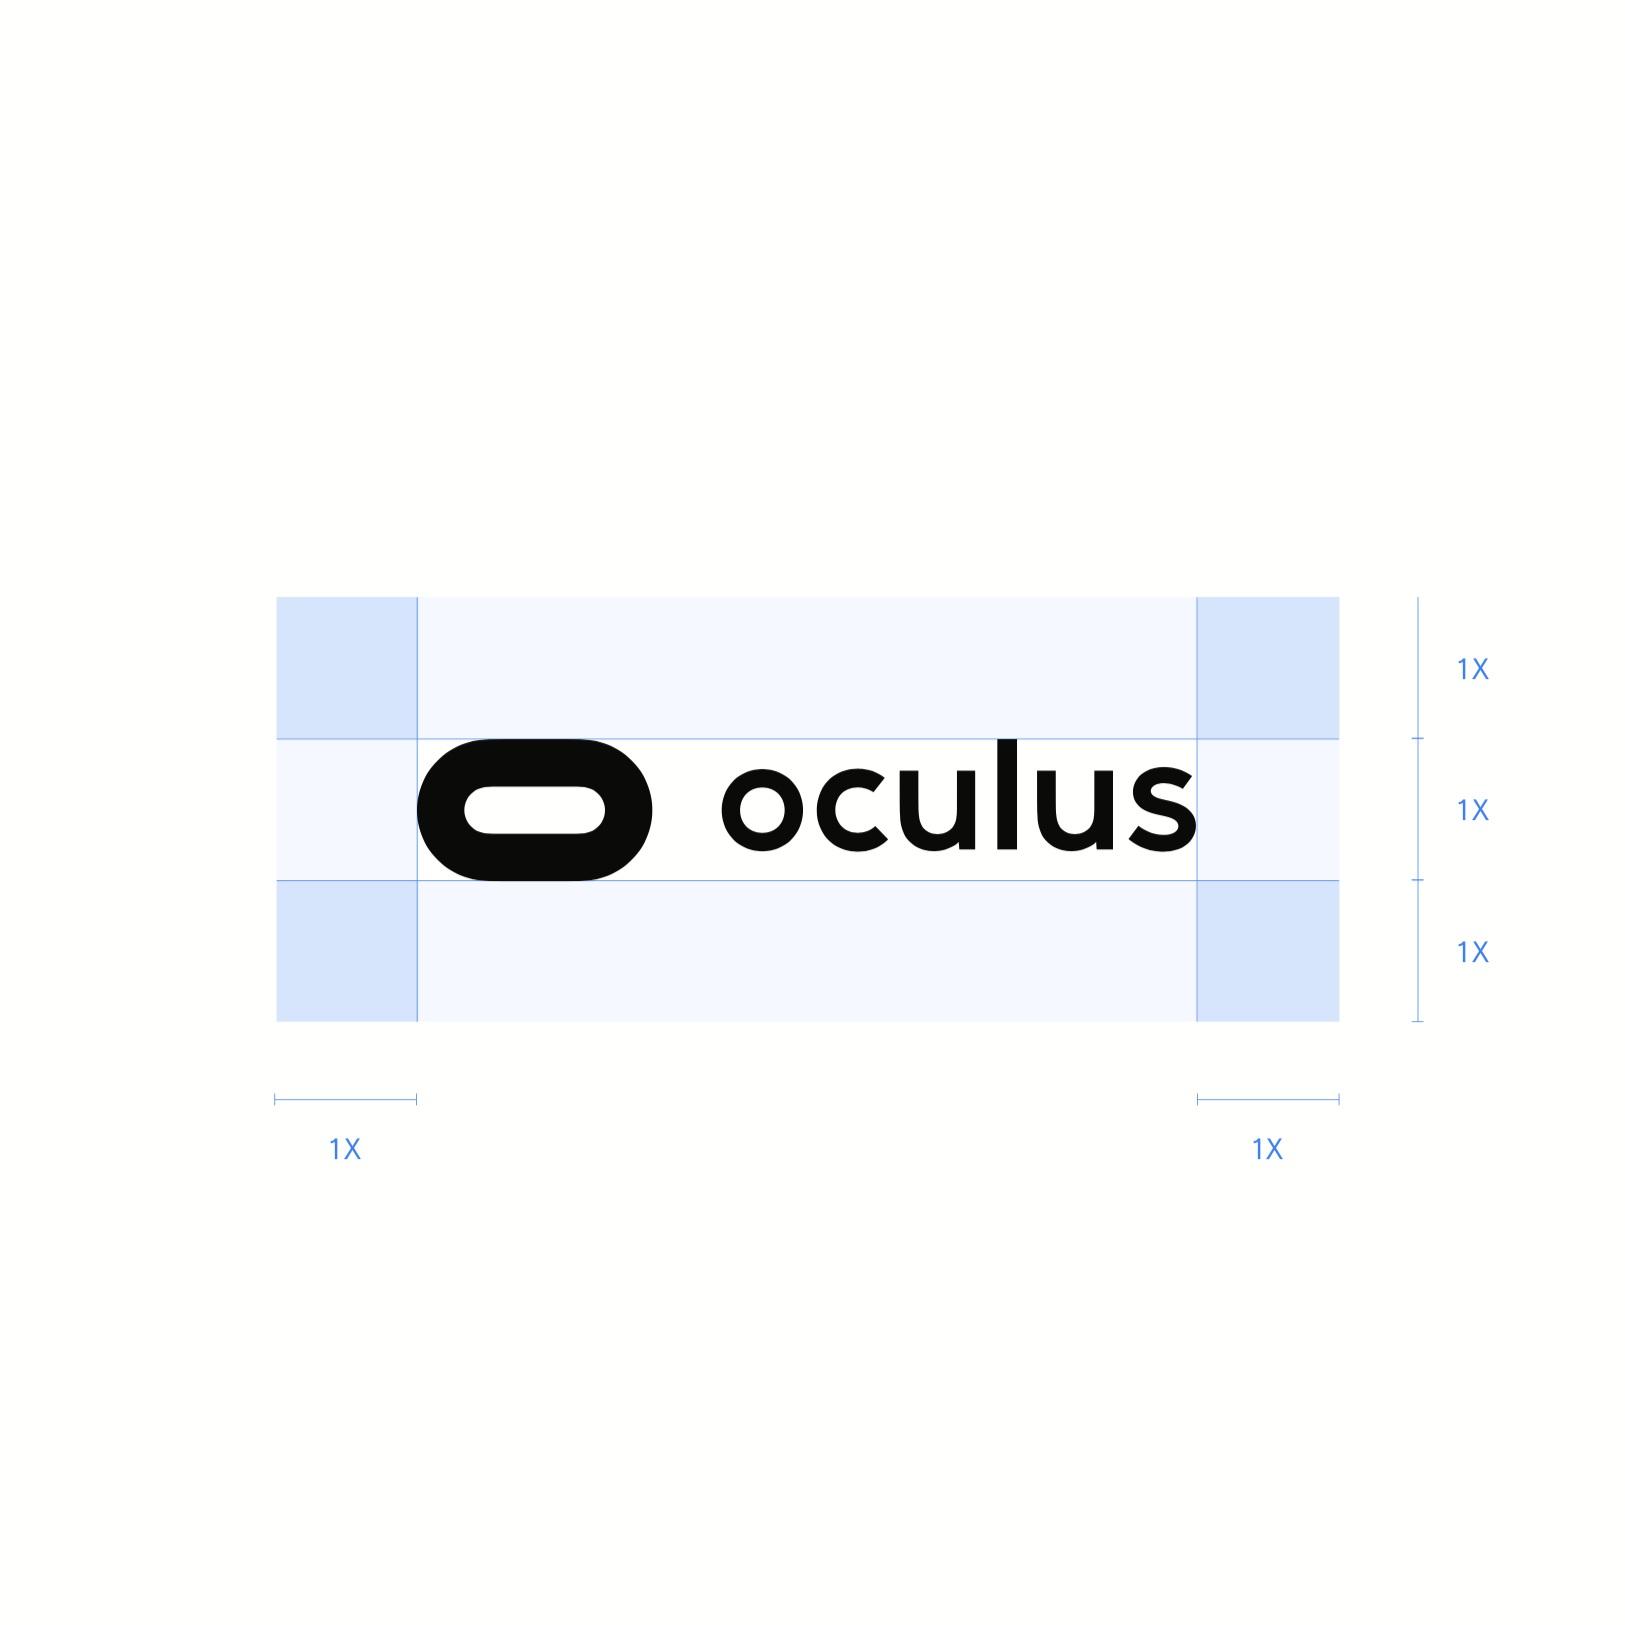 Oculus Brand Guidelines